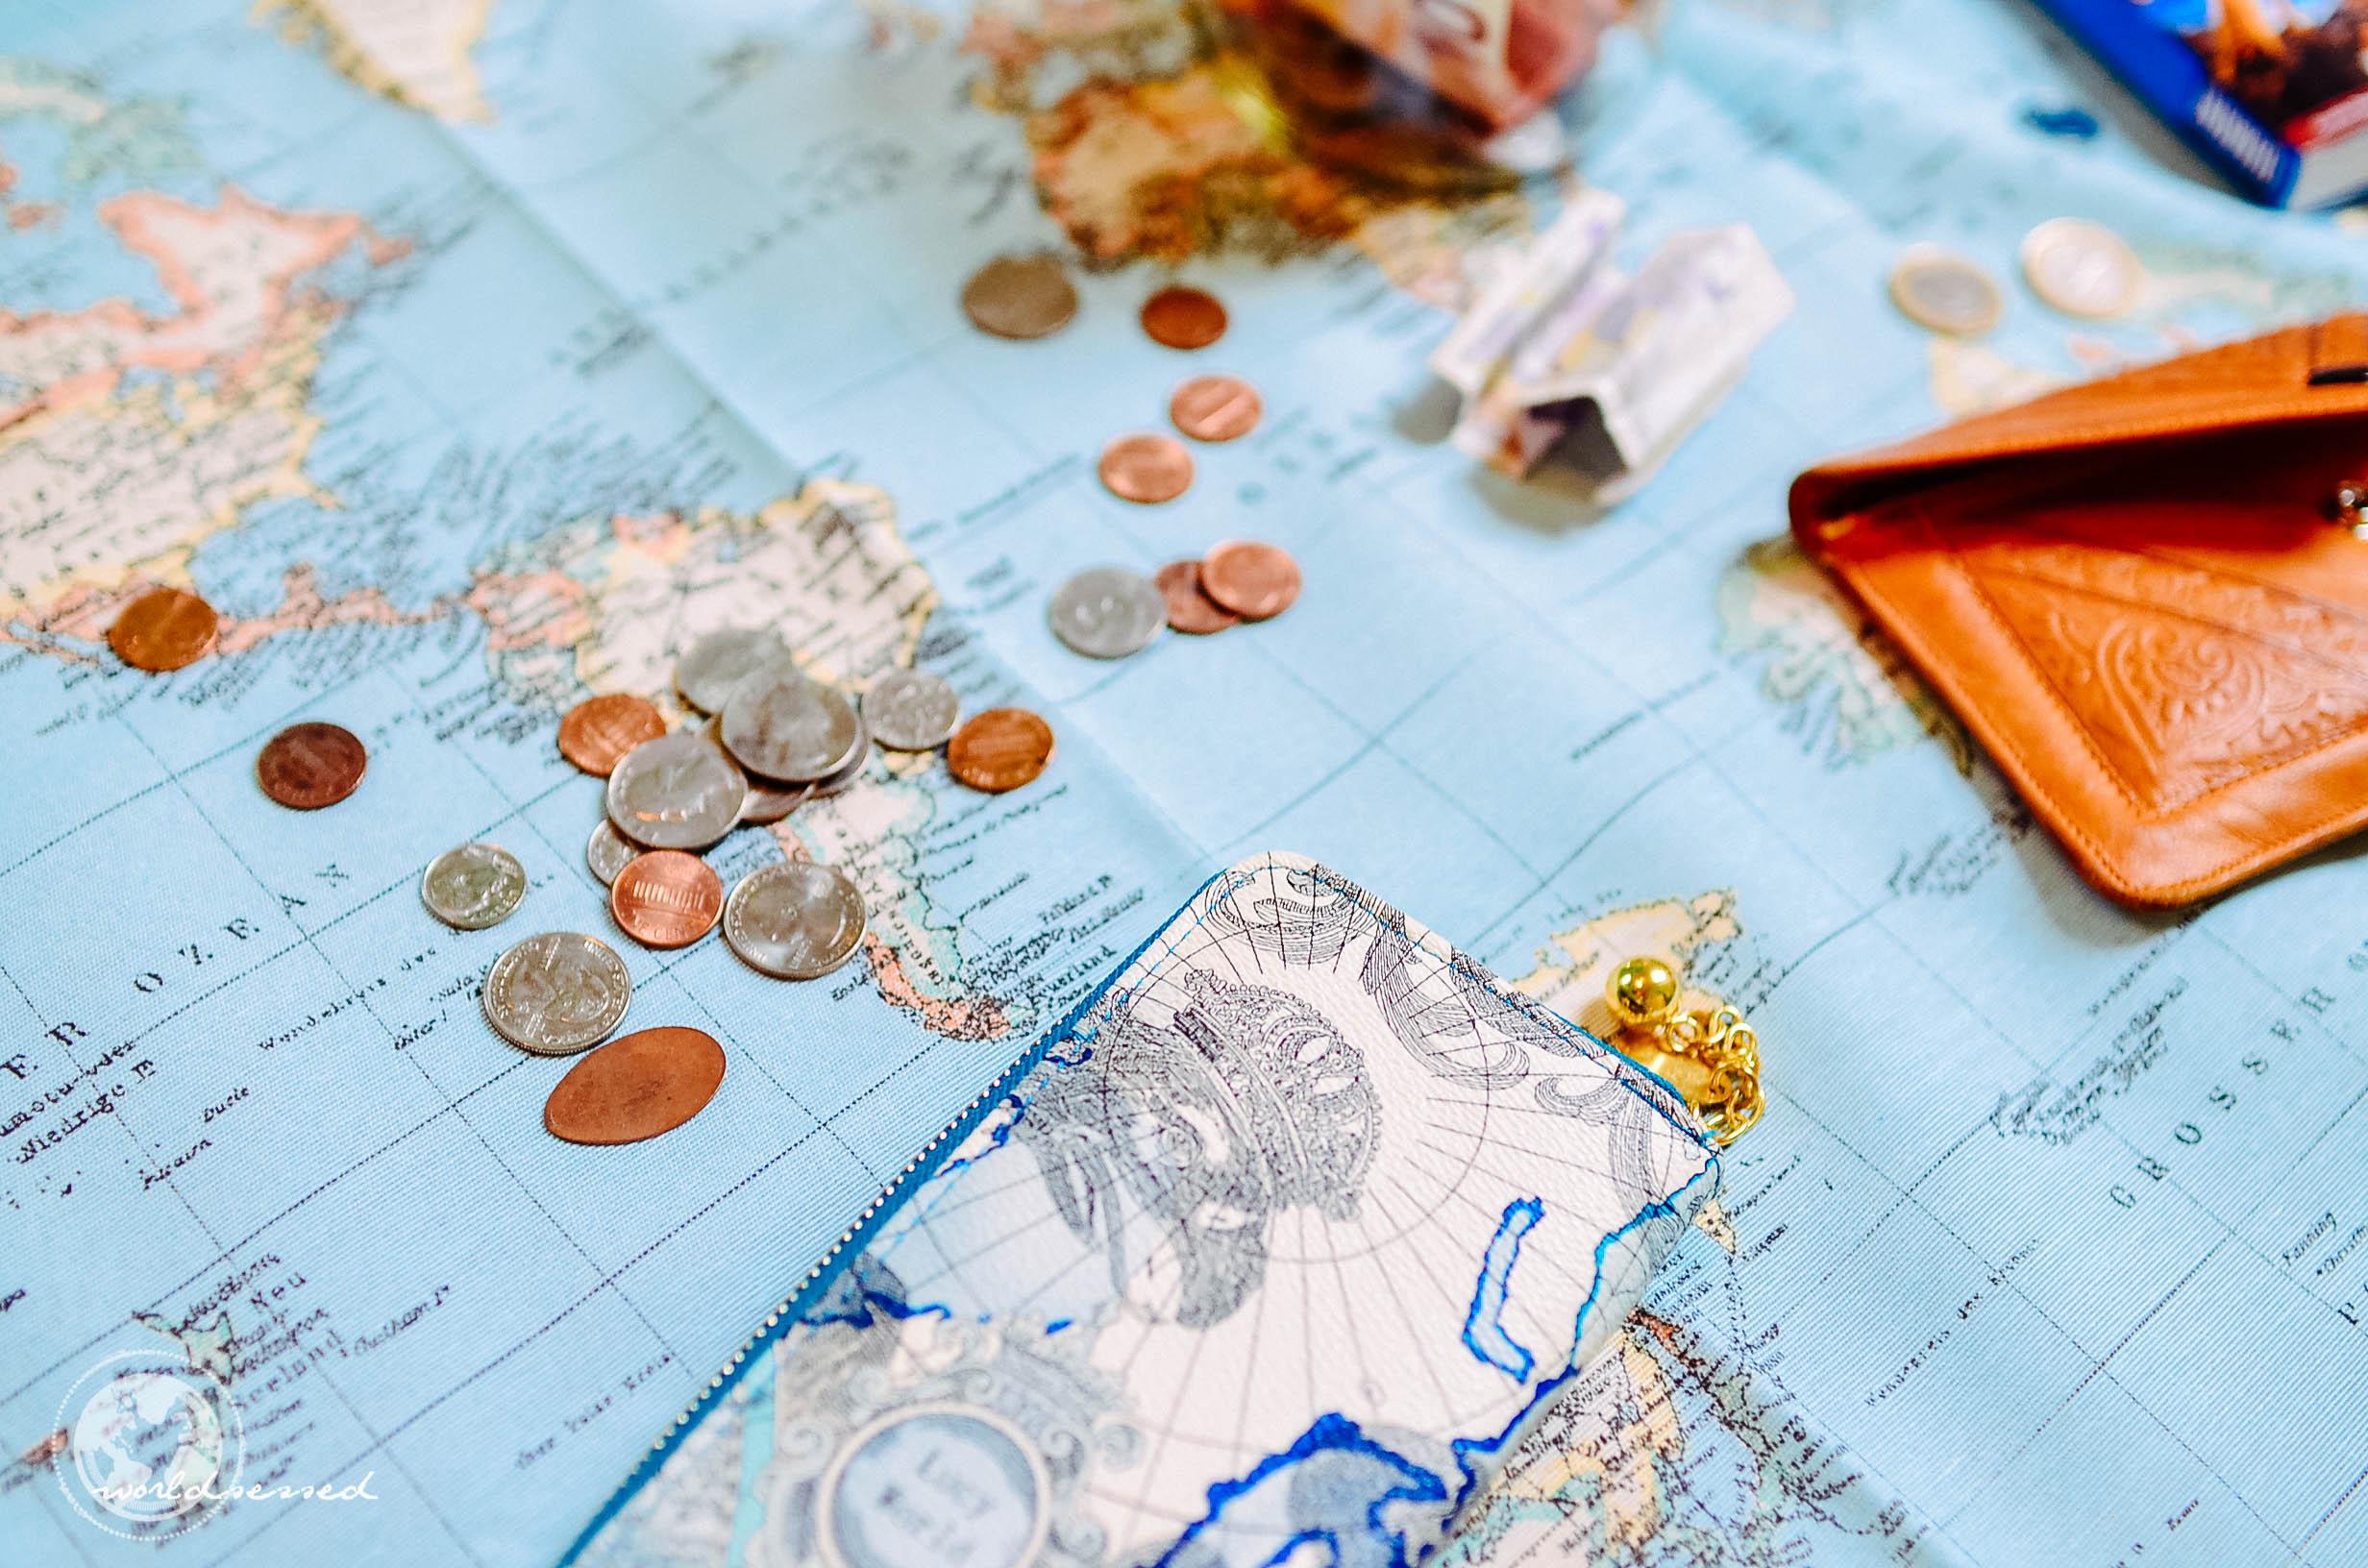 10 steps to book a cheaper city trip